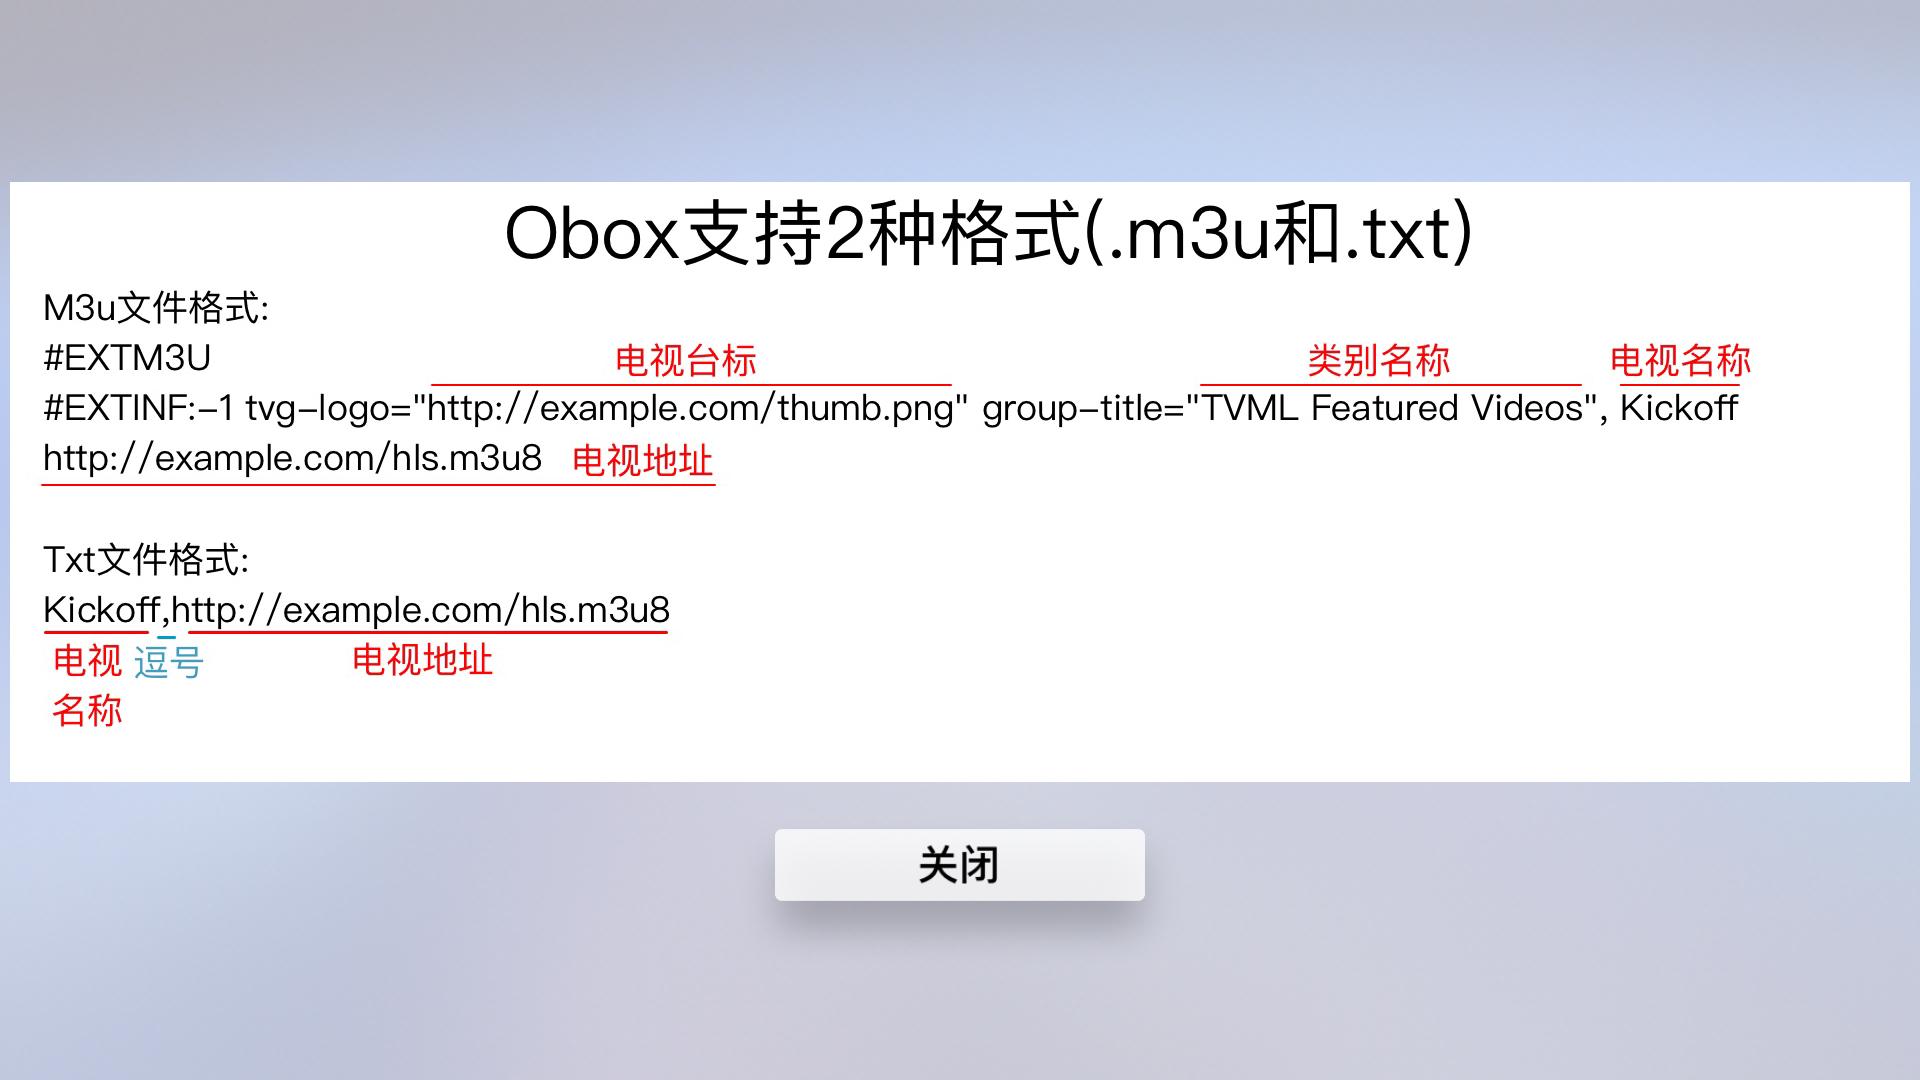 obox screenshot 7